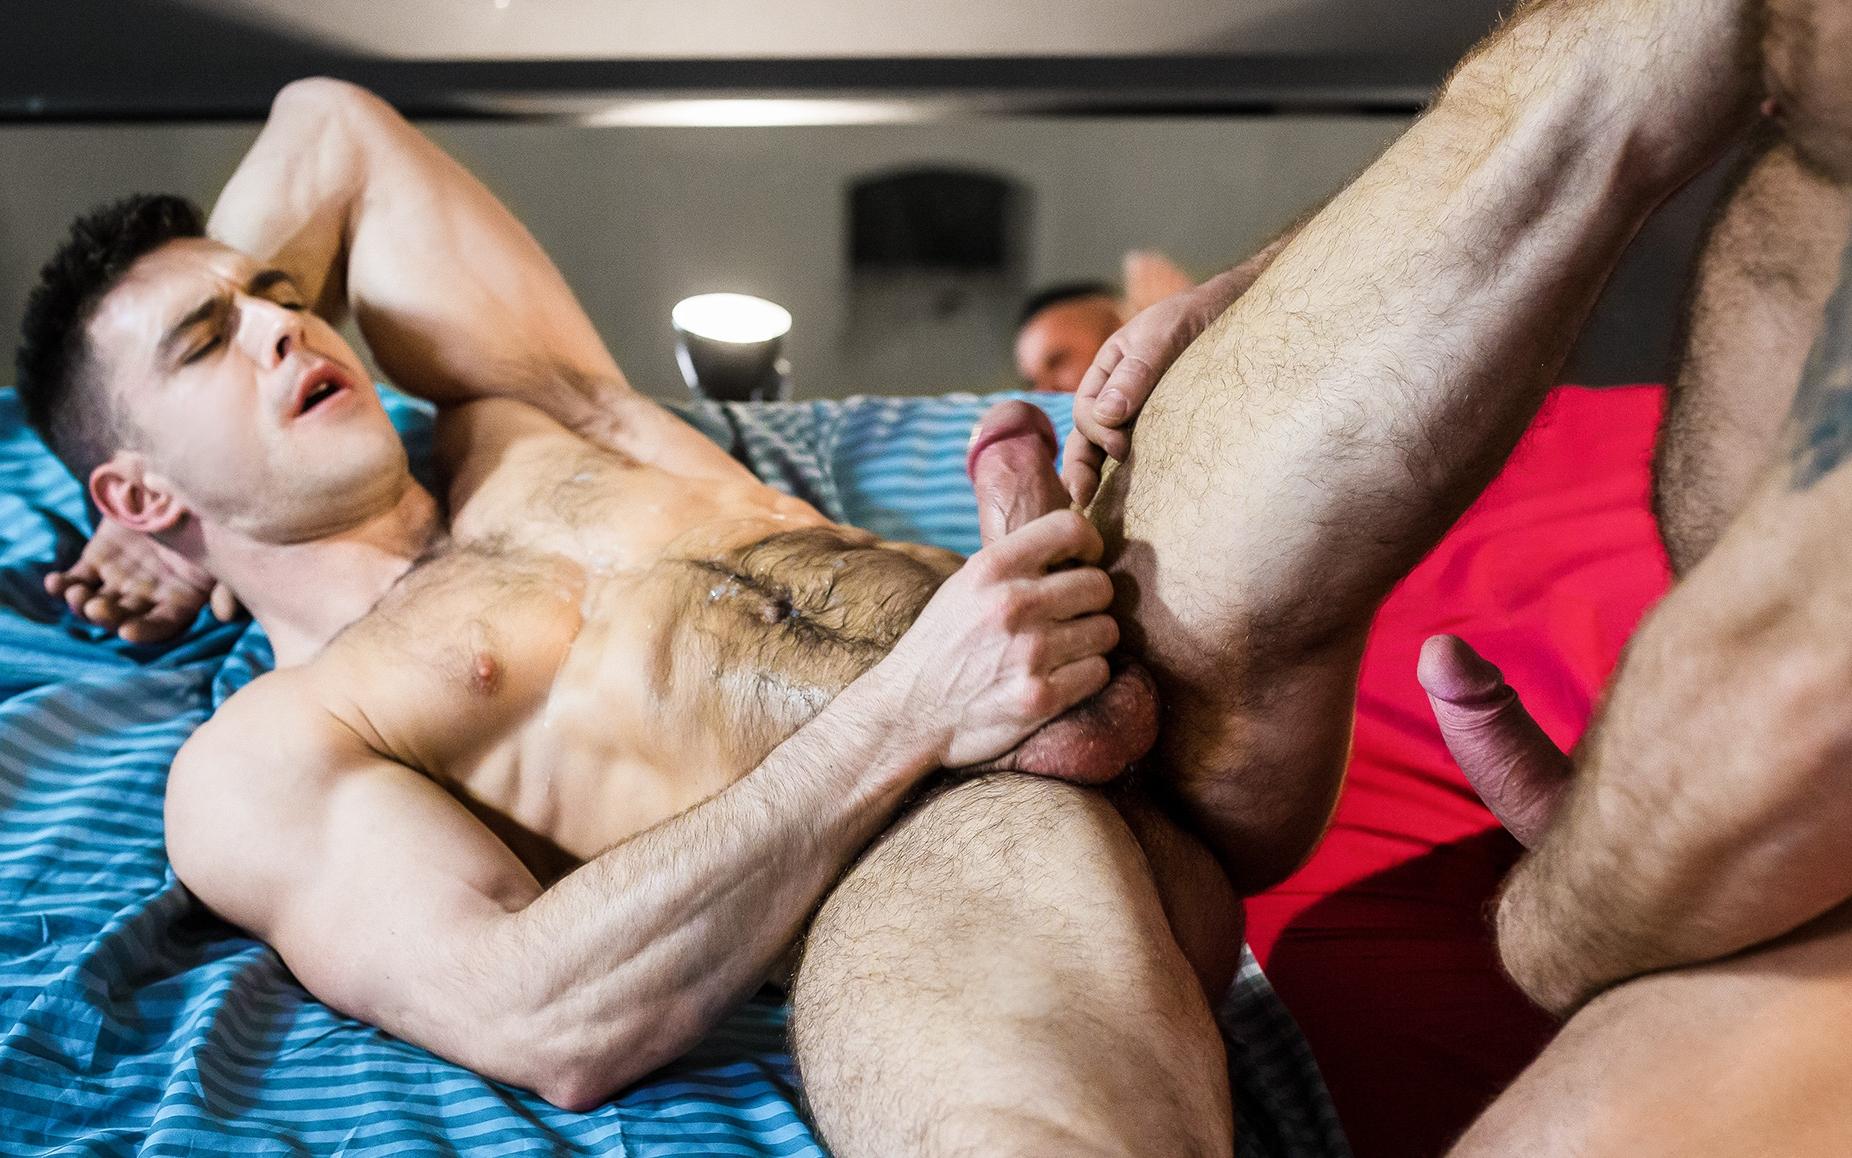 male porn stars gay